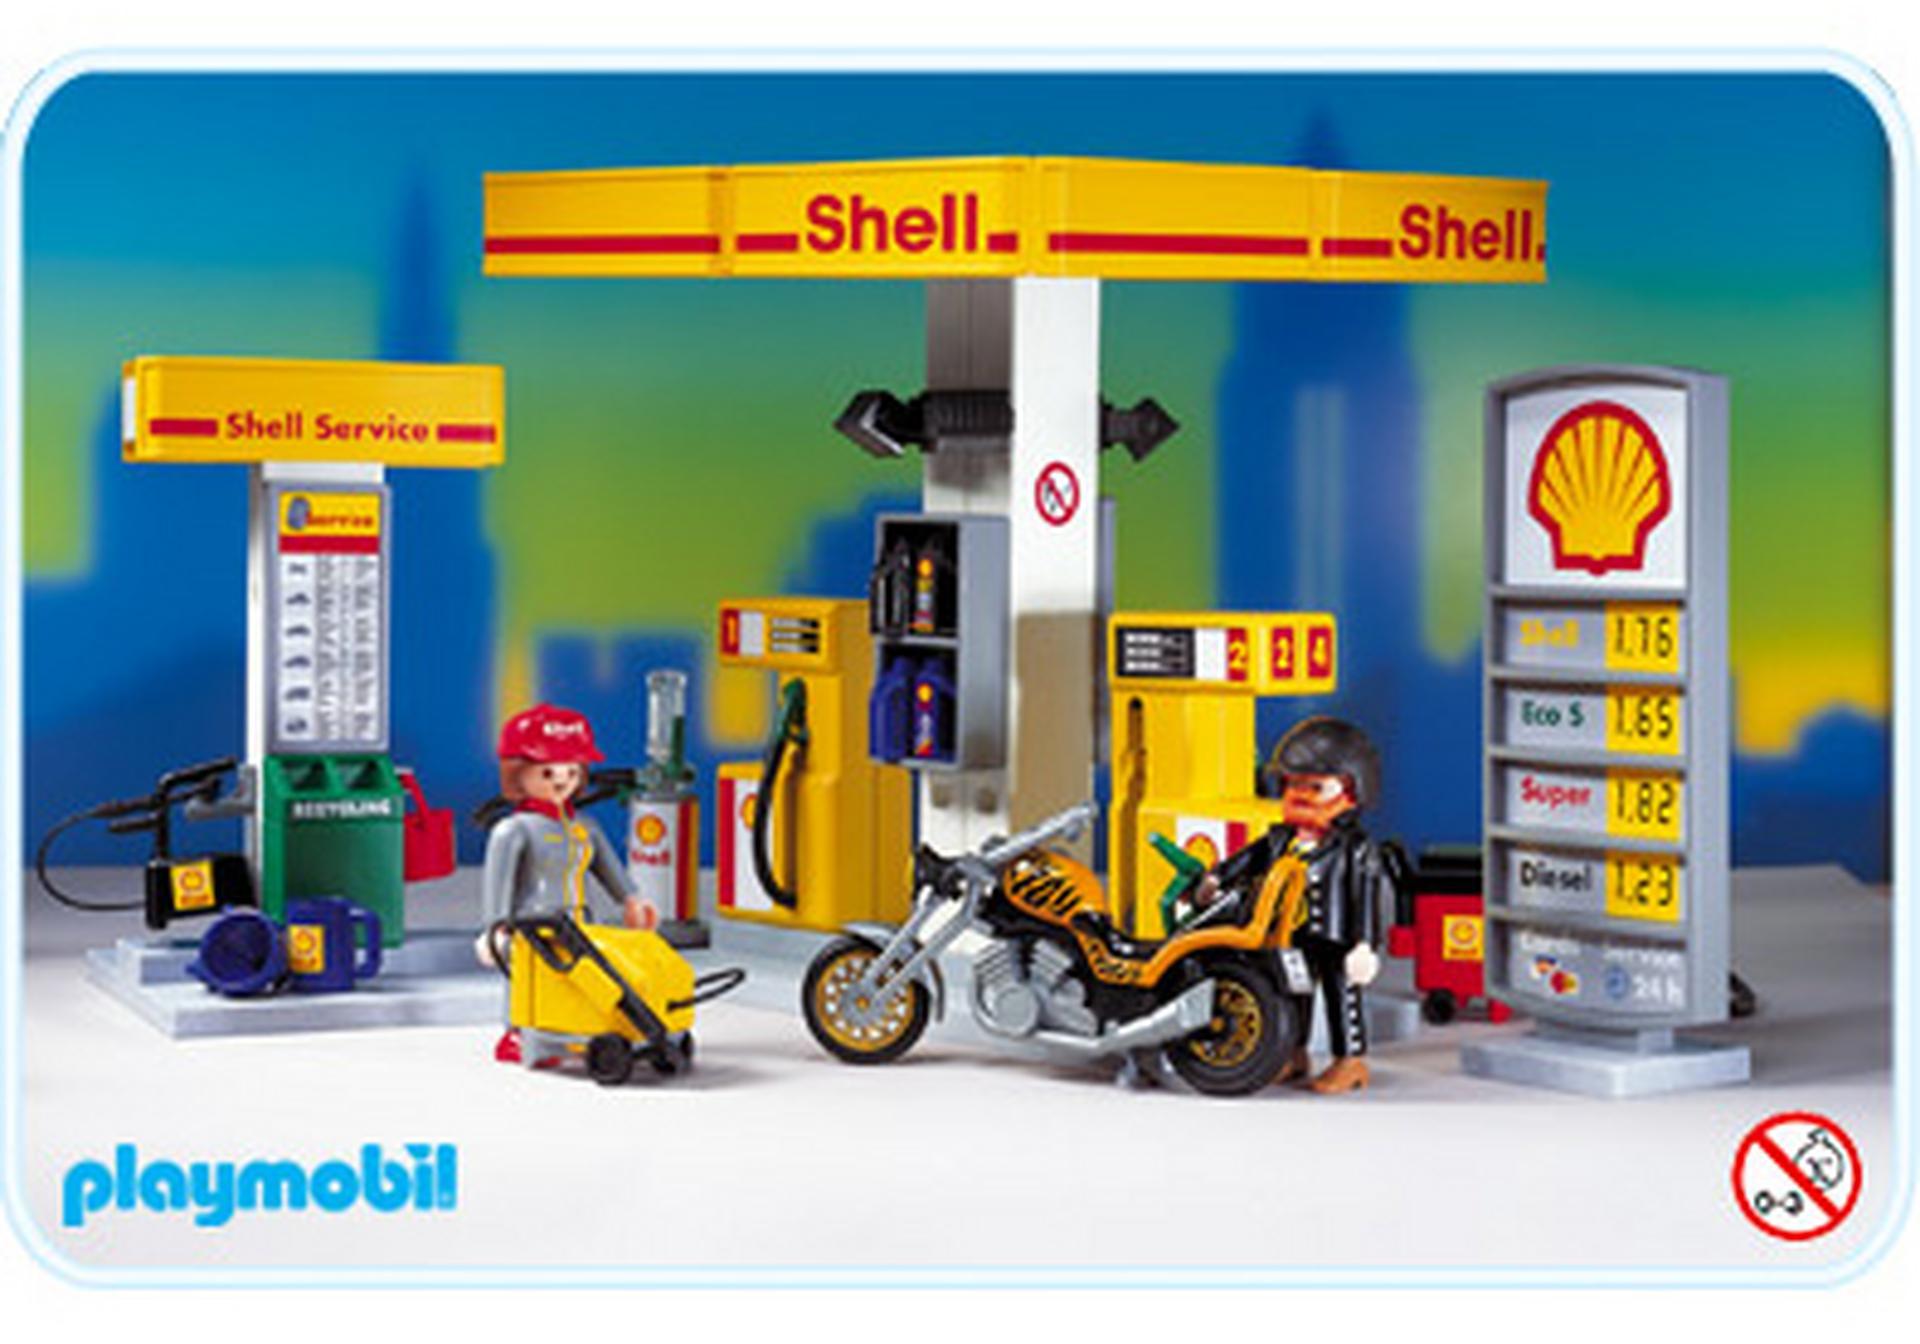 Tankstelle 3014 a playmobil deutschland for Jugendzimmer playmobil